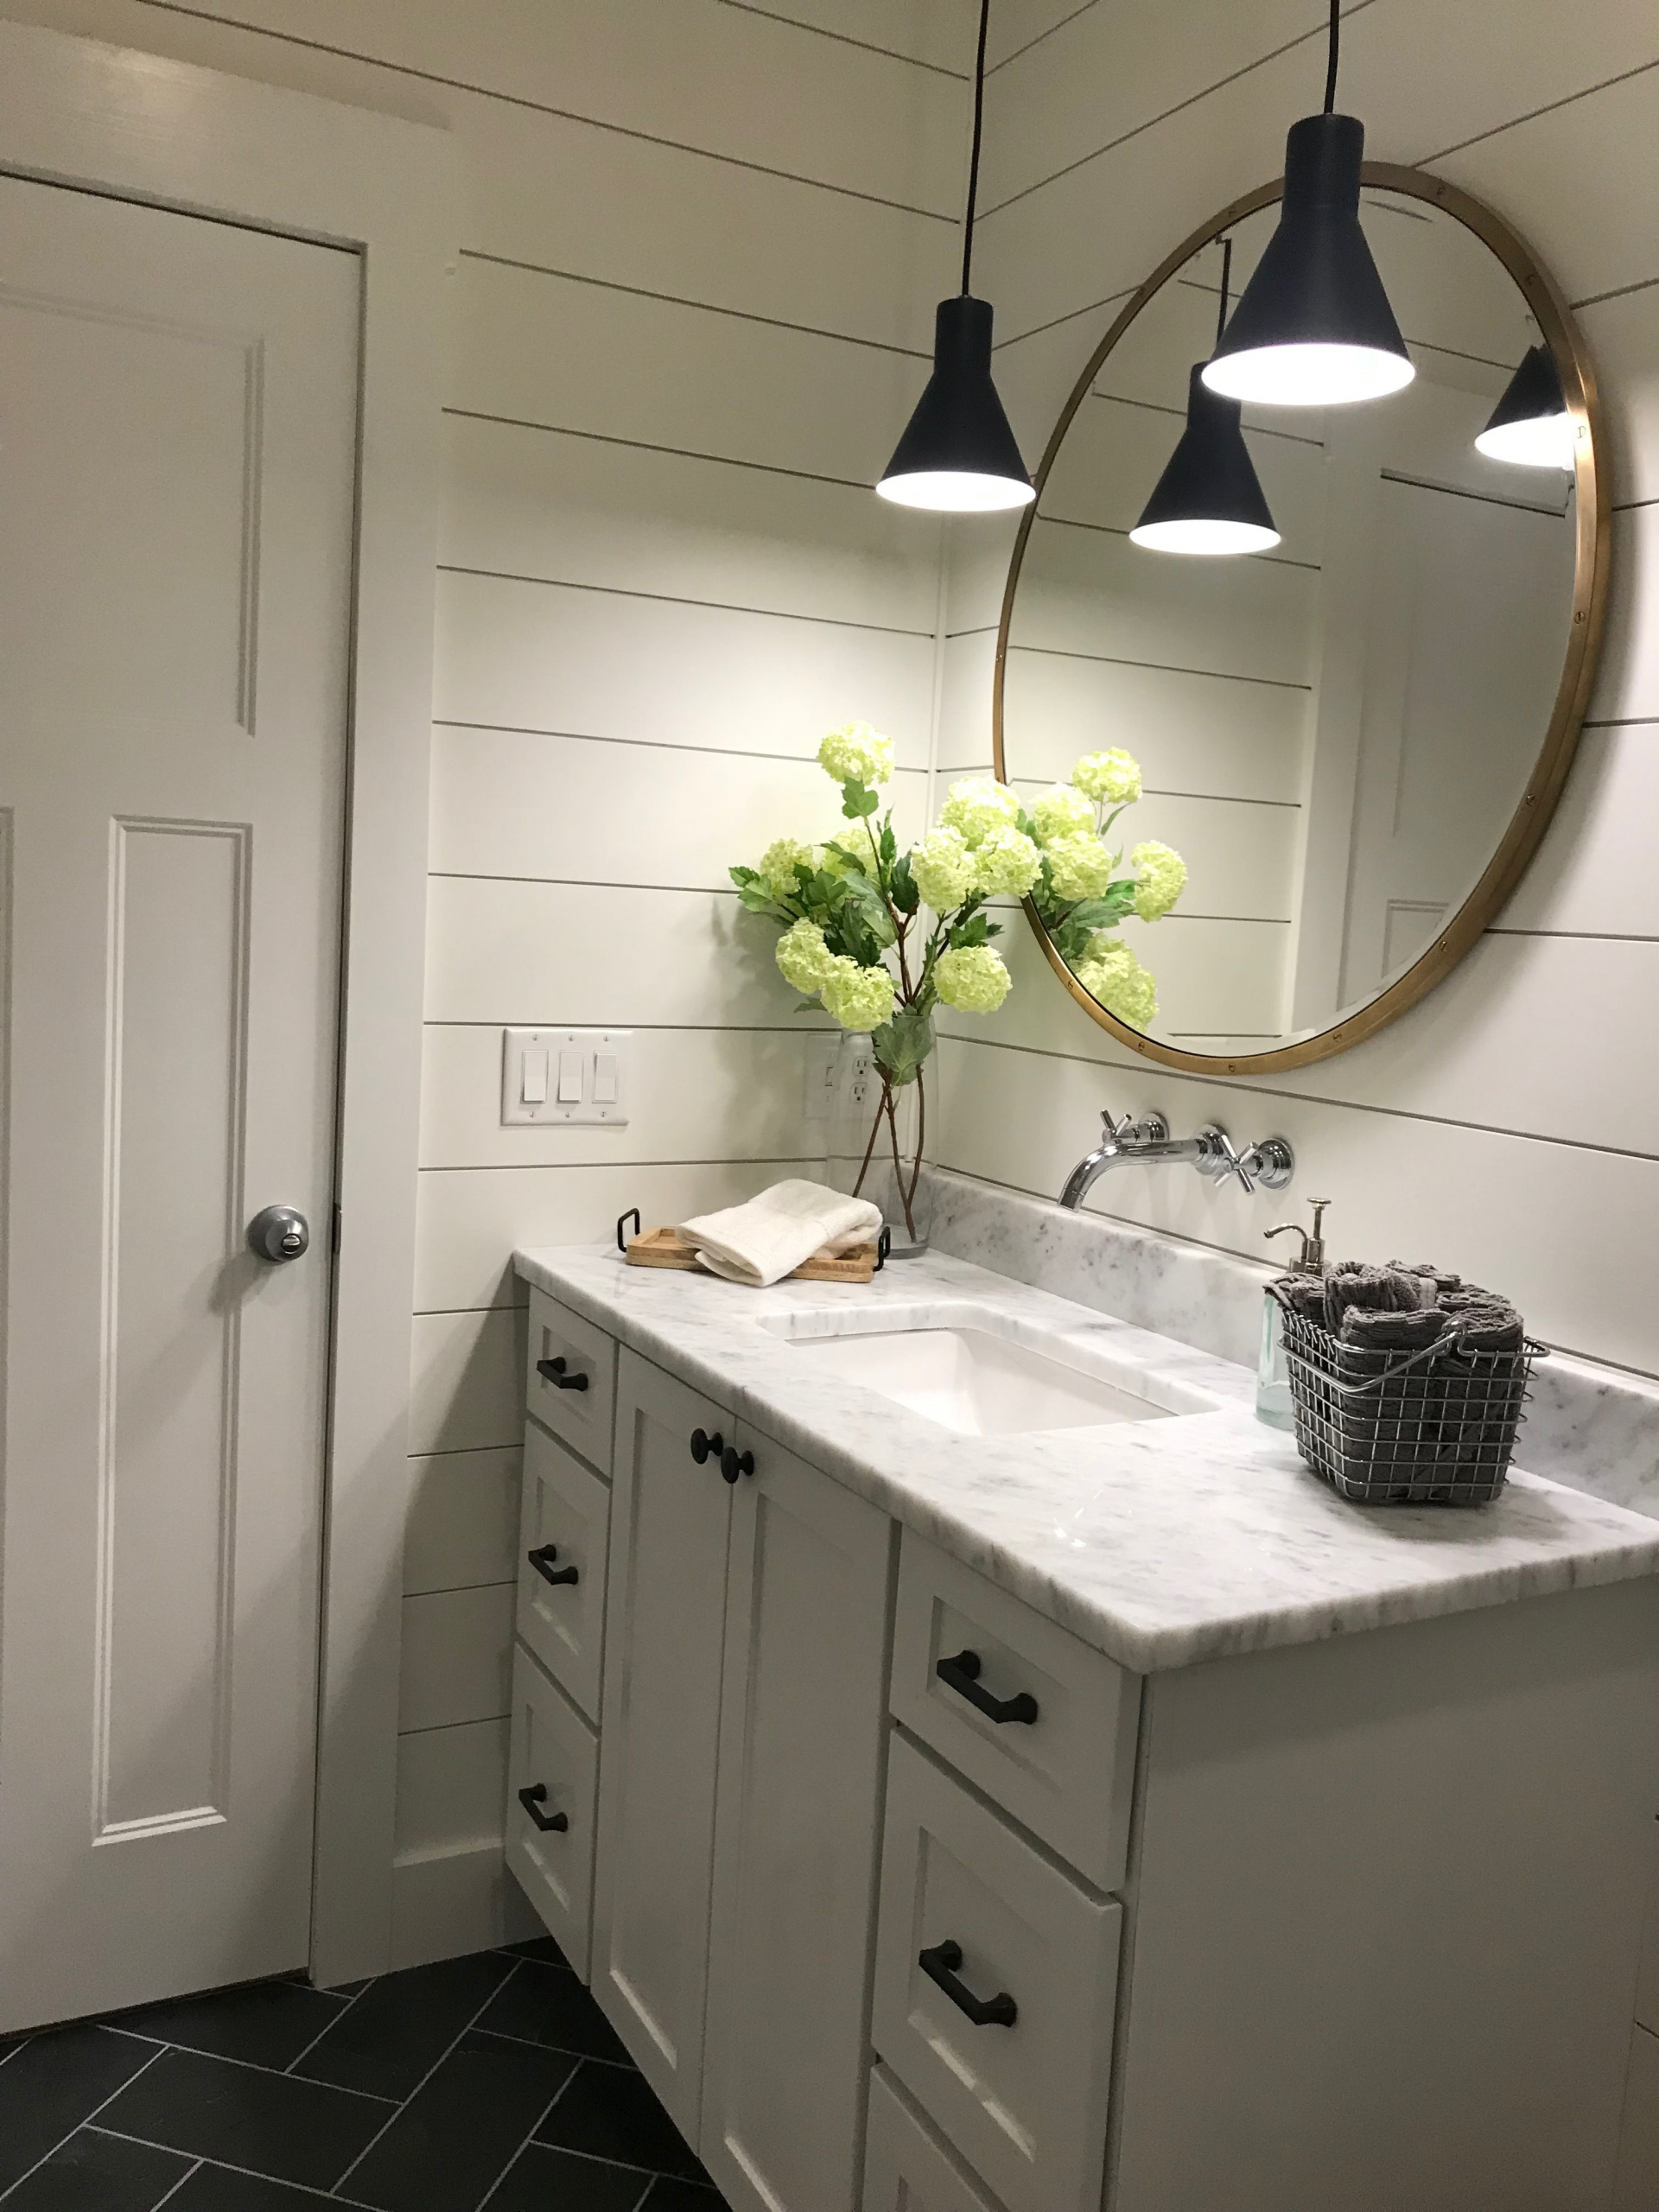 Unique Farmhouse Master Bathroom Round Mirror Bathroom Laundry In 2020 Bathrooms Remodel Bathroom Decor Bathroom Design